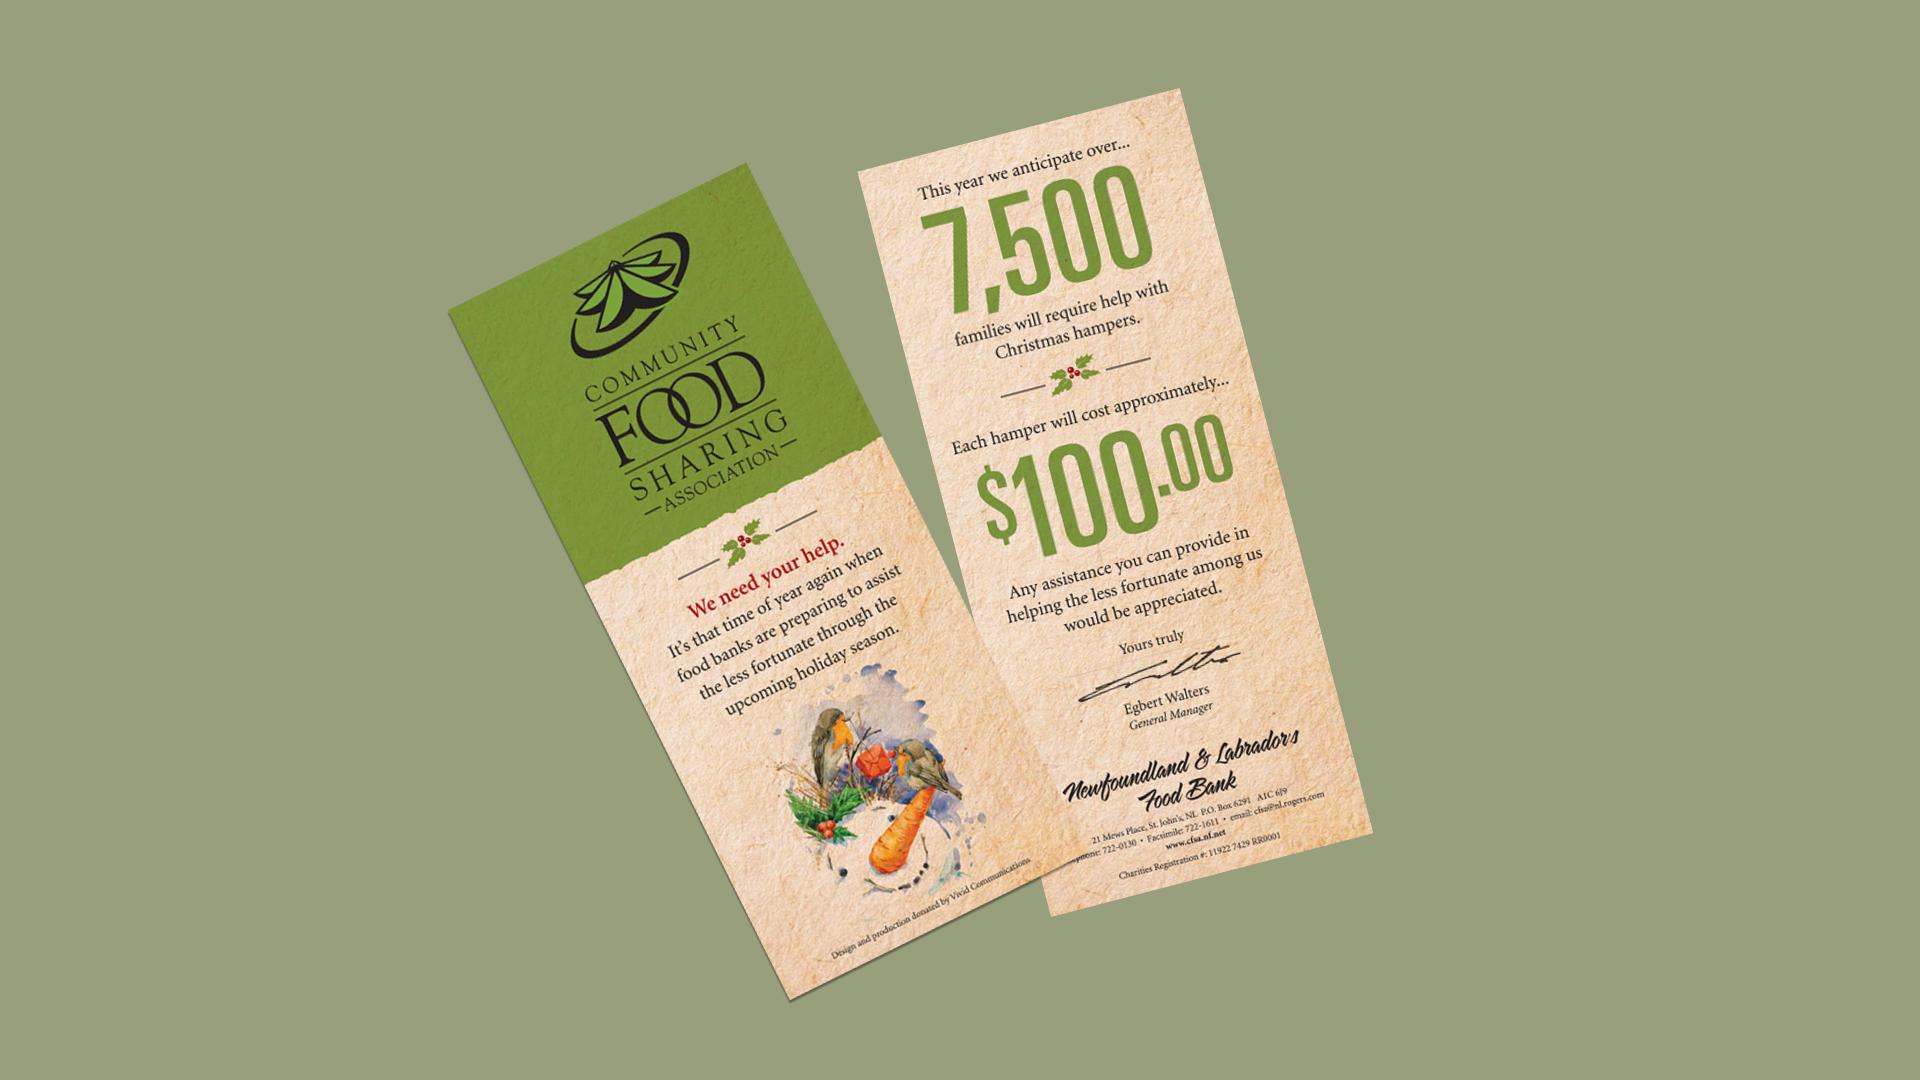 Community Food Sharing Card